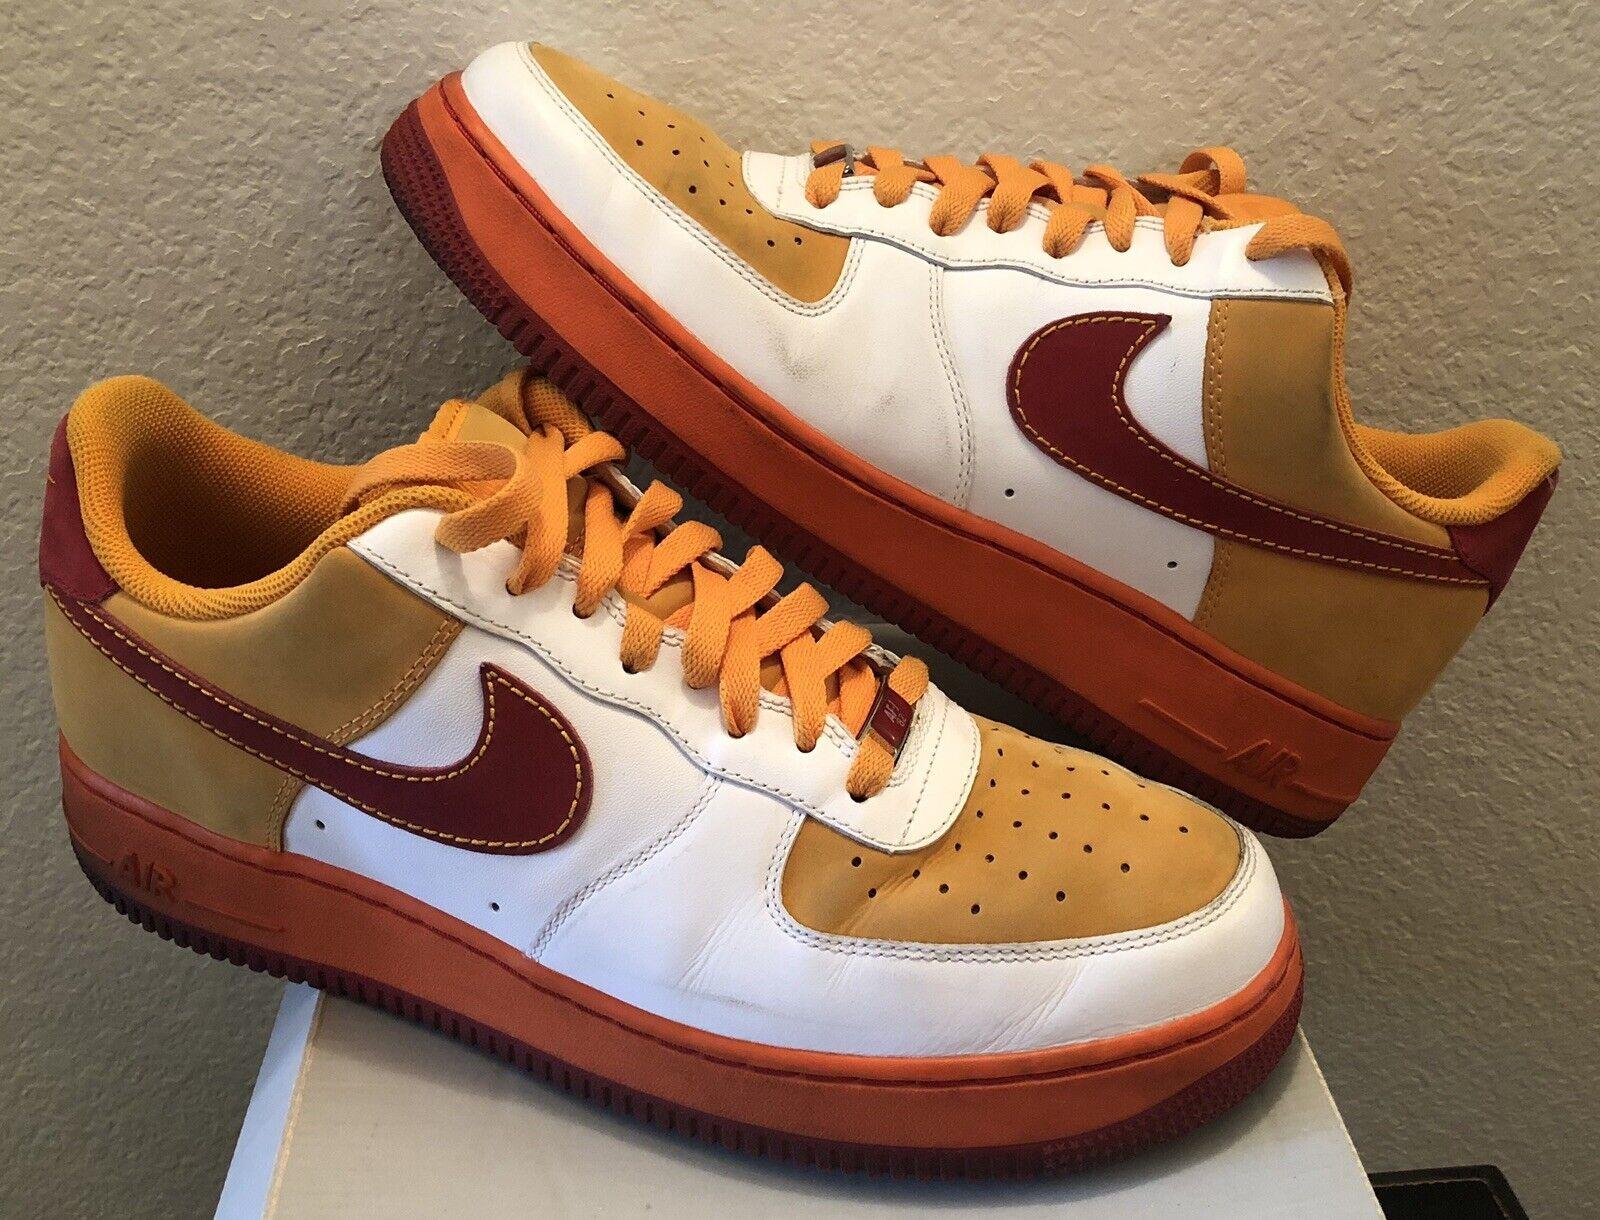 Nike Air Force 1 Low 07 VARSITY RED ORANGE | Mens Size 12 ...